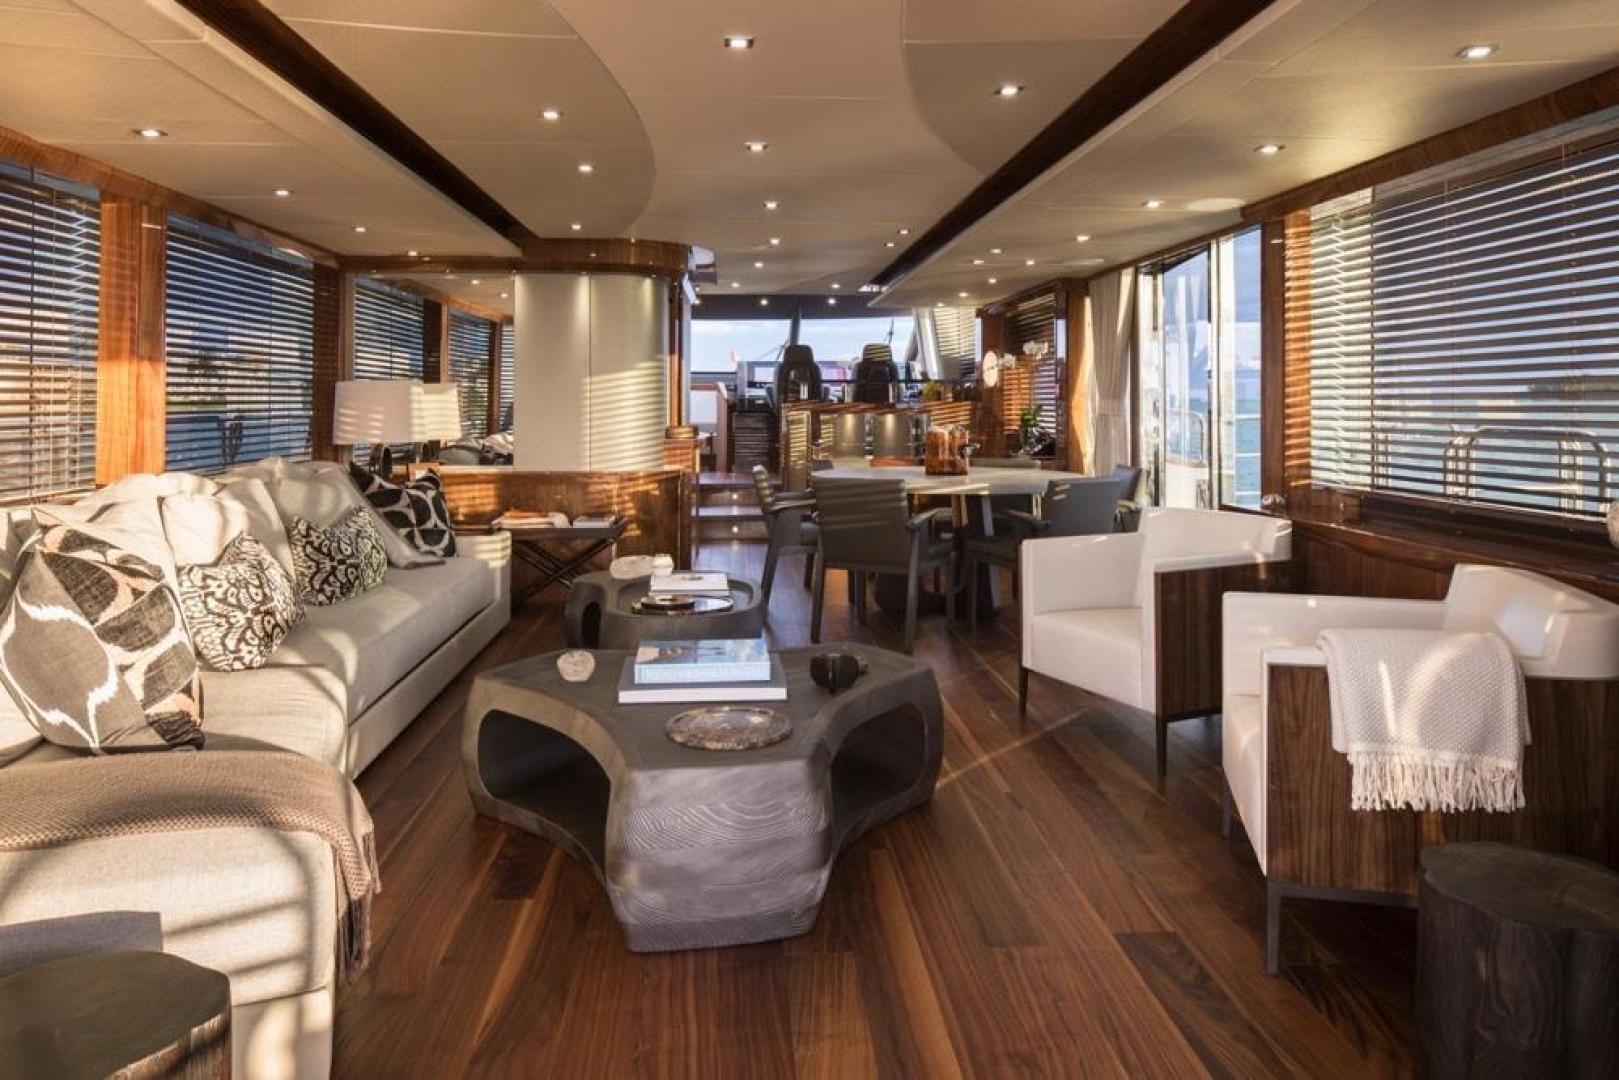 Sunseeker-28 Metre Yacht 2016-RIII Miami-Florida-United States-2016 SUNSEEKER 92 RIII FOR SALE-600093 | Thumbnail